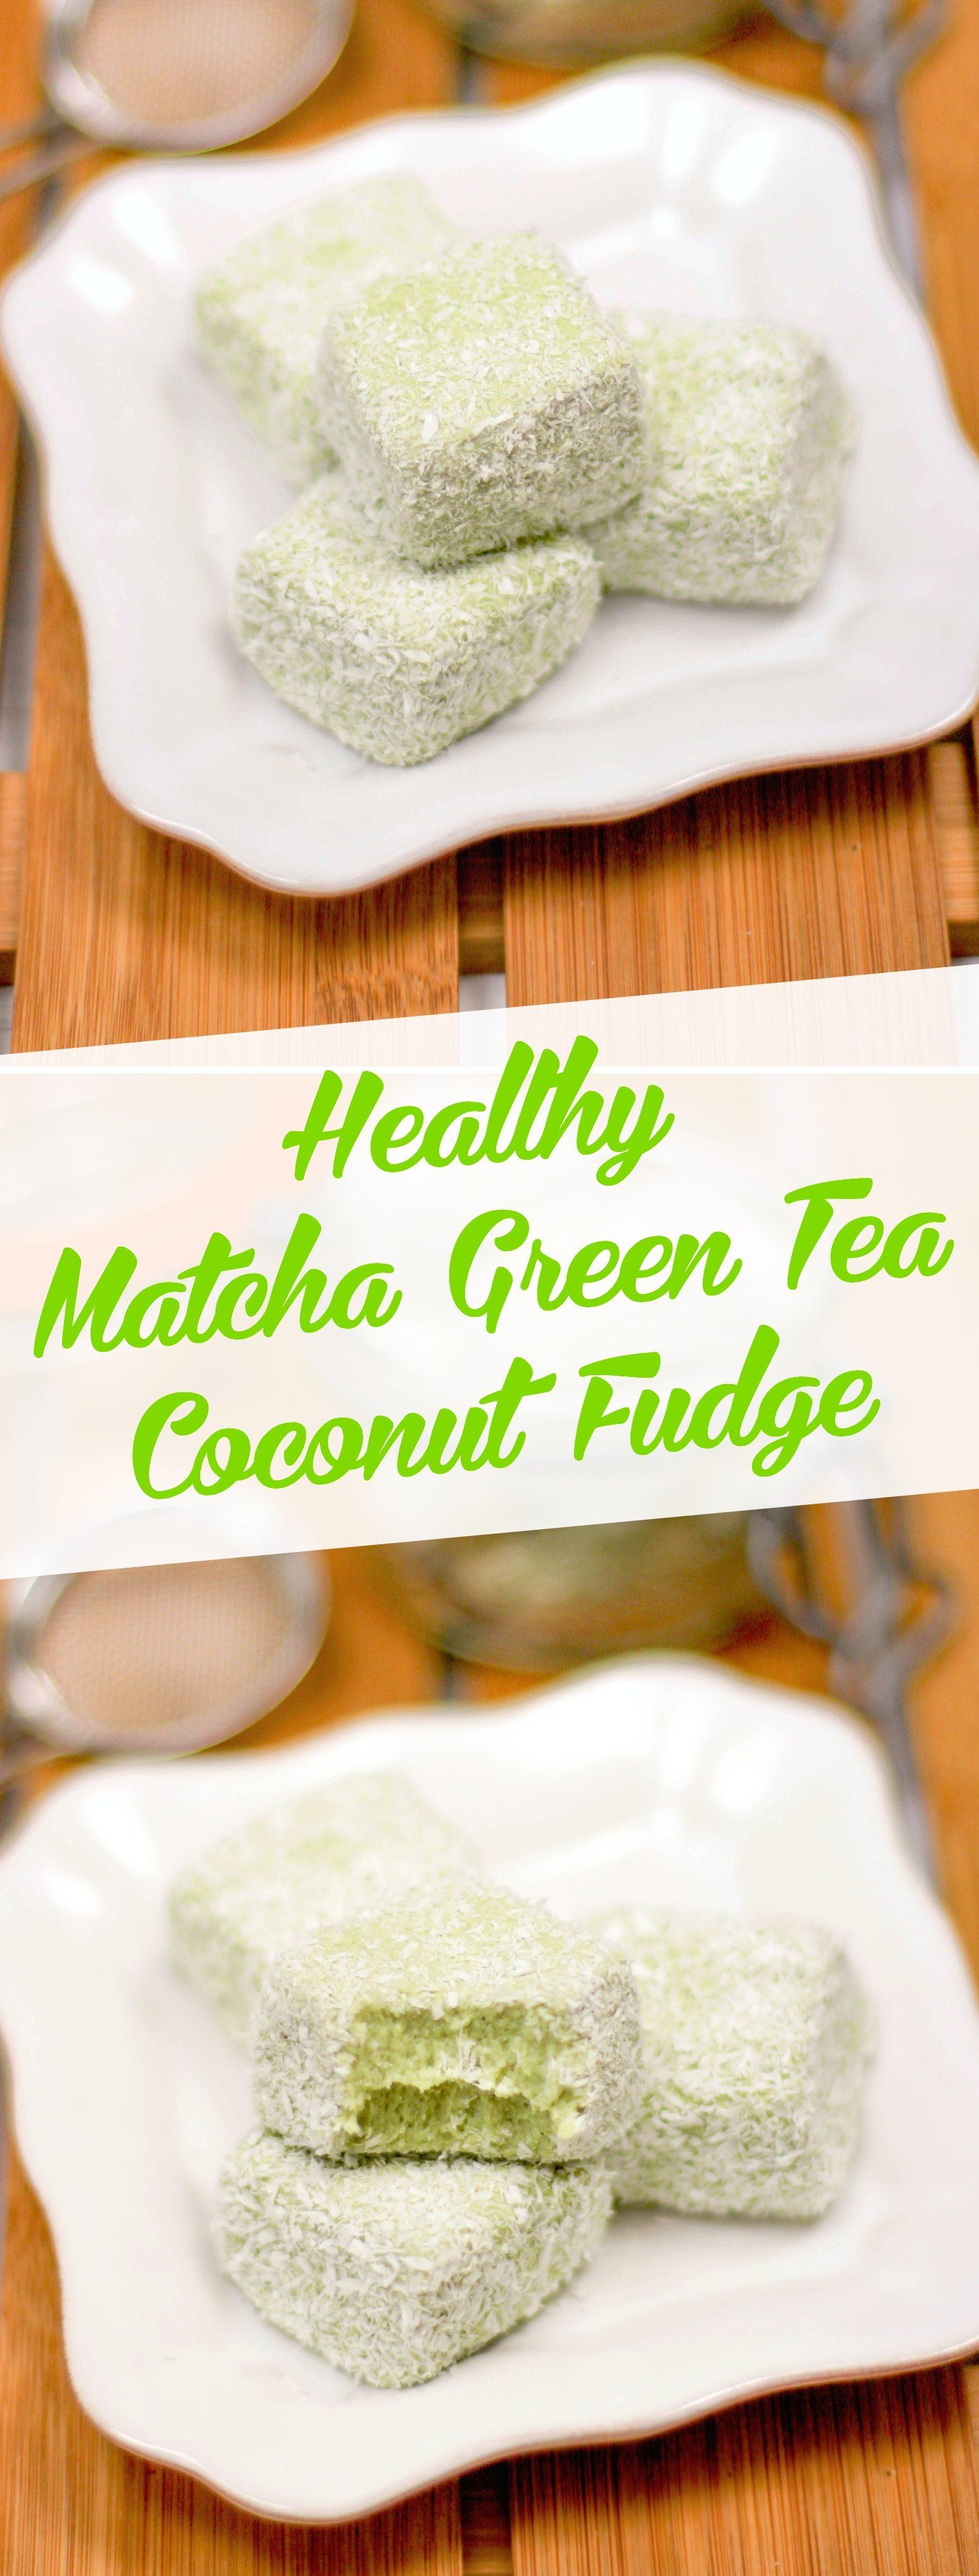 Healthy Matcha Coconut Fudge - Desserts with Benefits